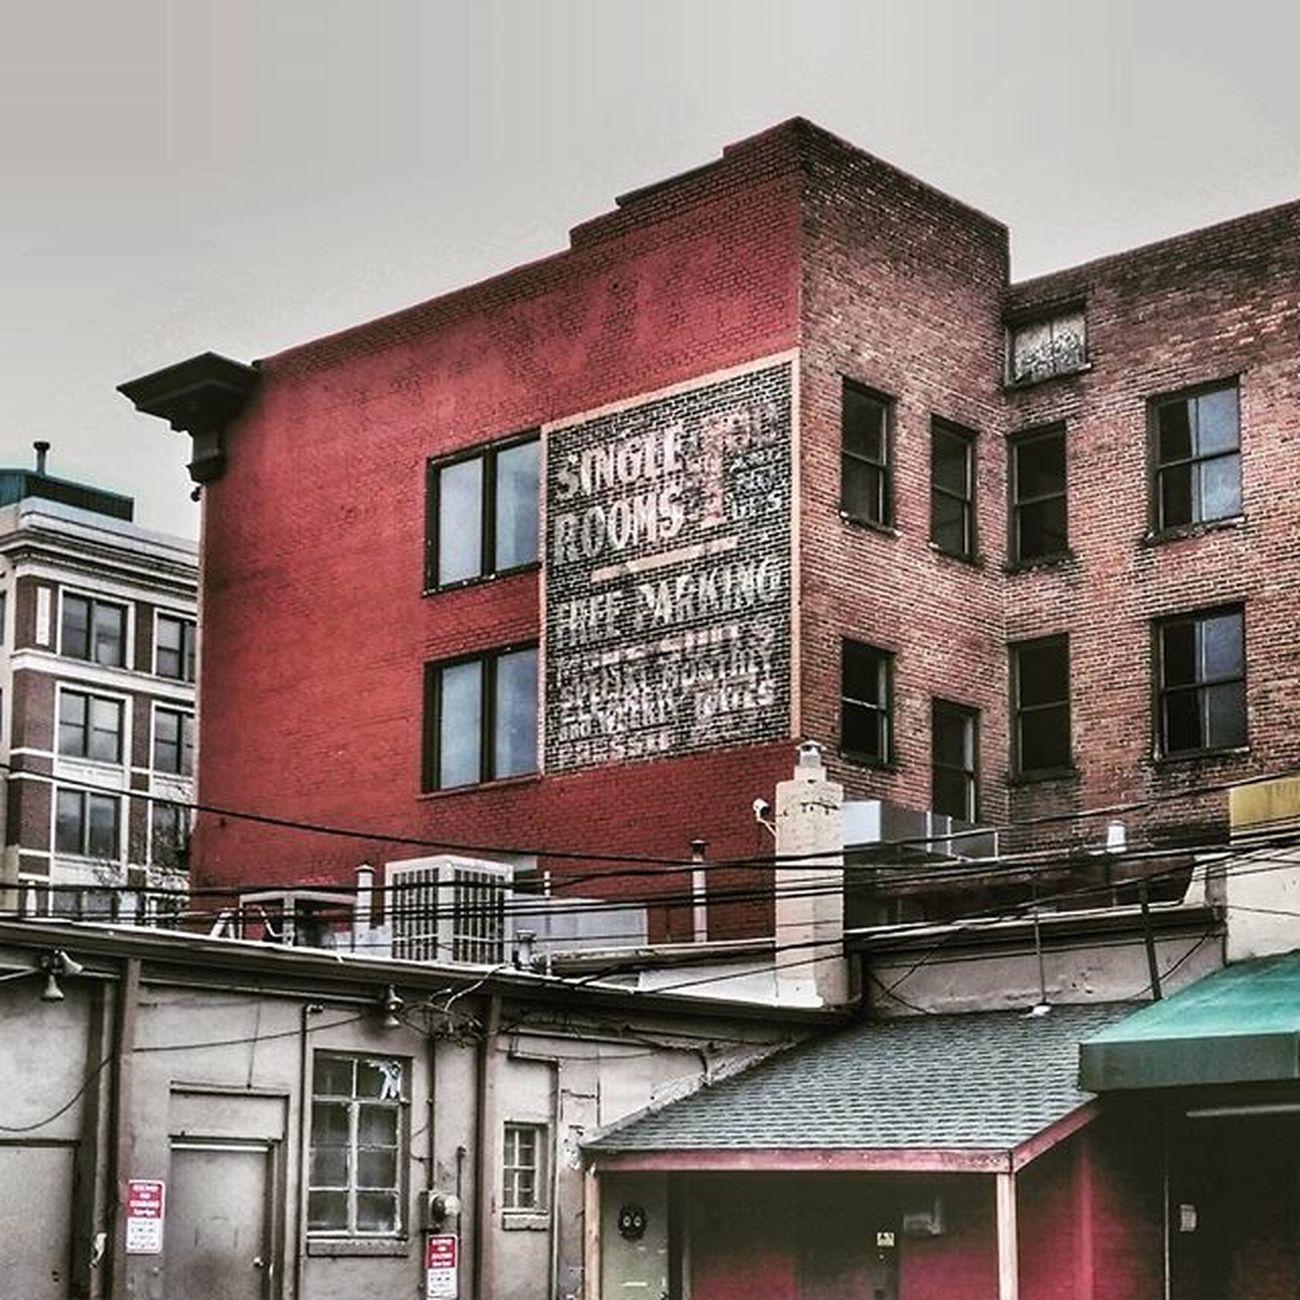 Ghostsigns Rsa_preciousjunk Rsa_streetview Denverstreets Denvertography Architecture Instagood